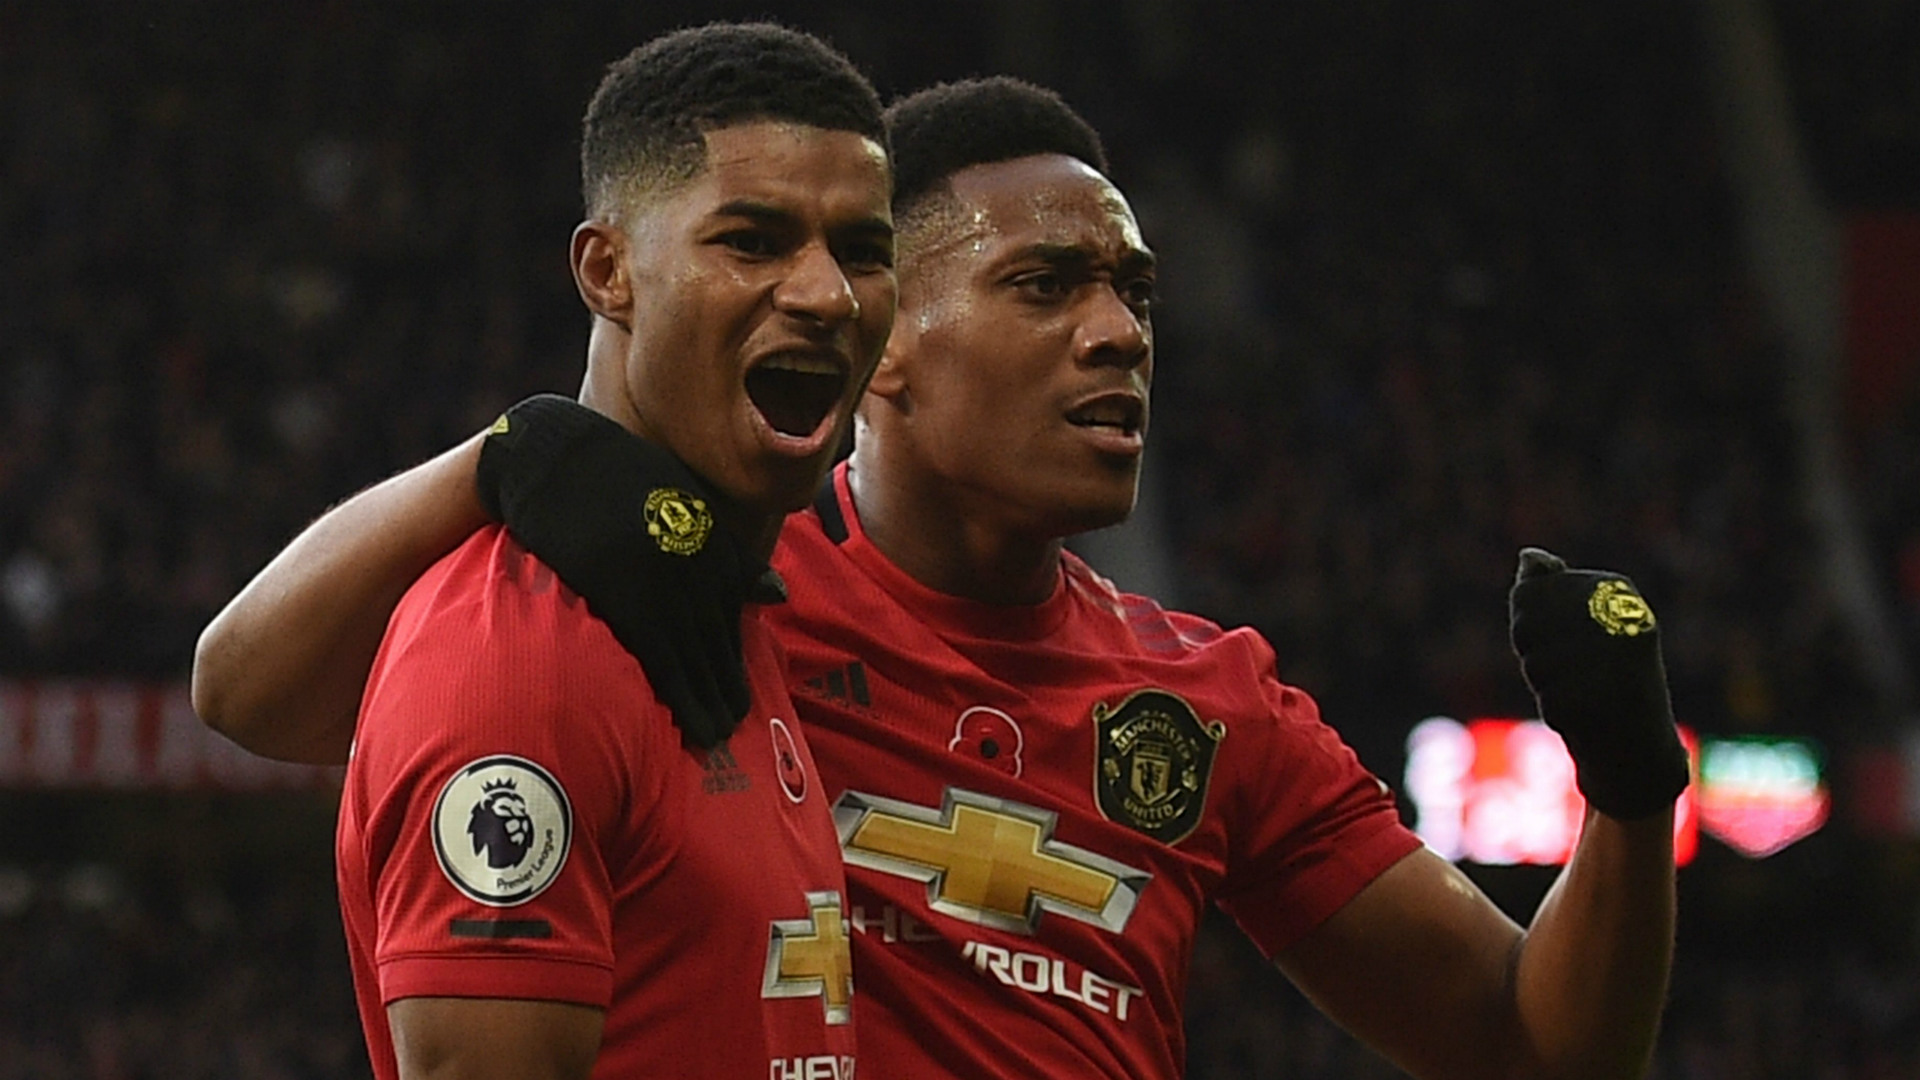 Marcus Rashford Anthony Martial Manchester United 2019-20